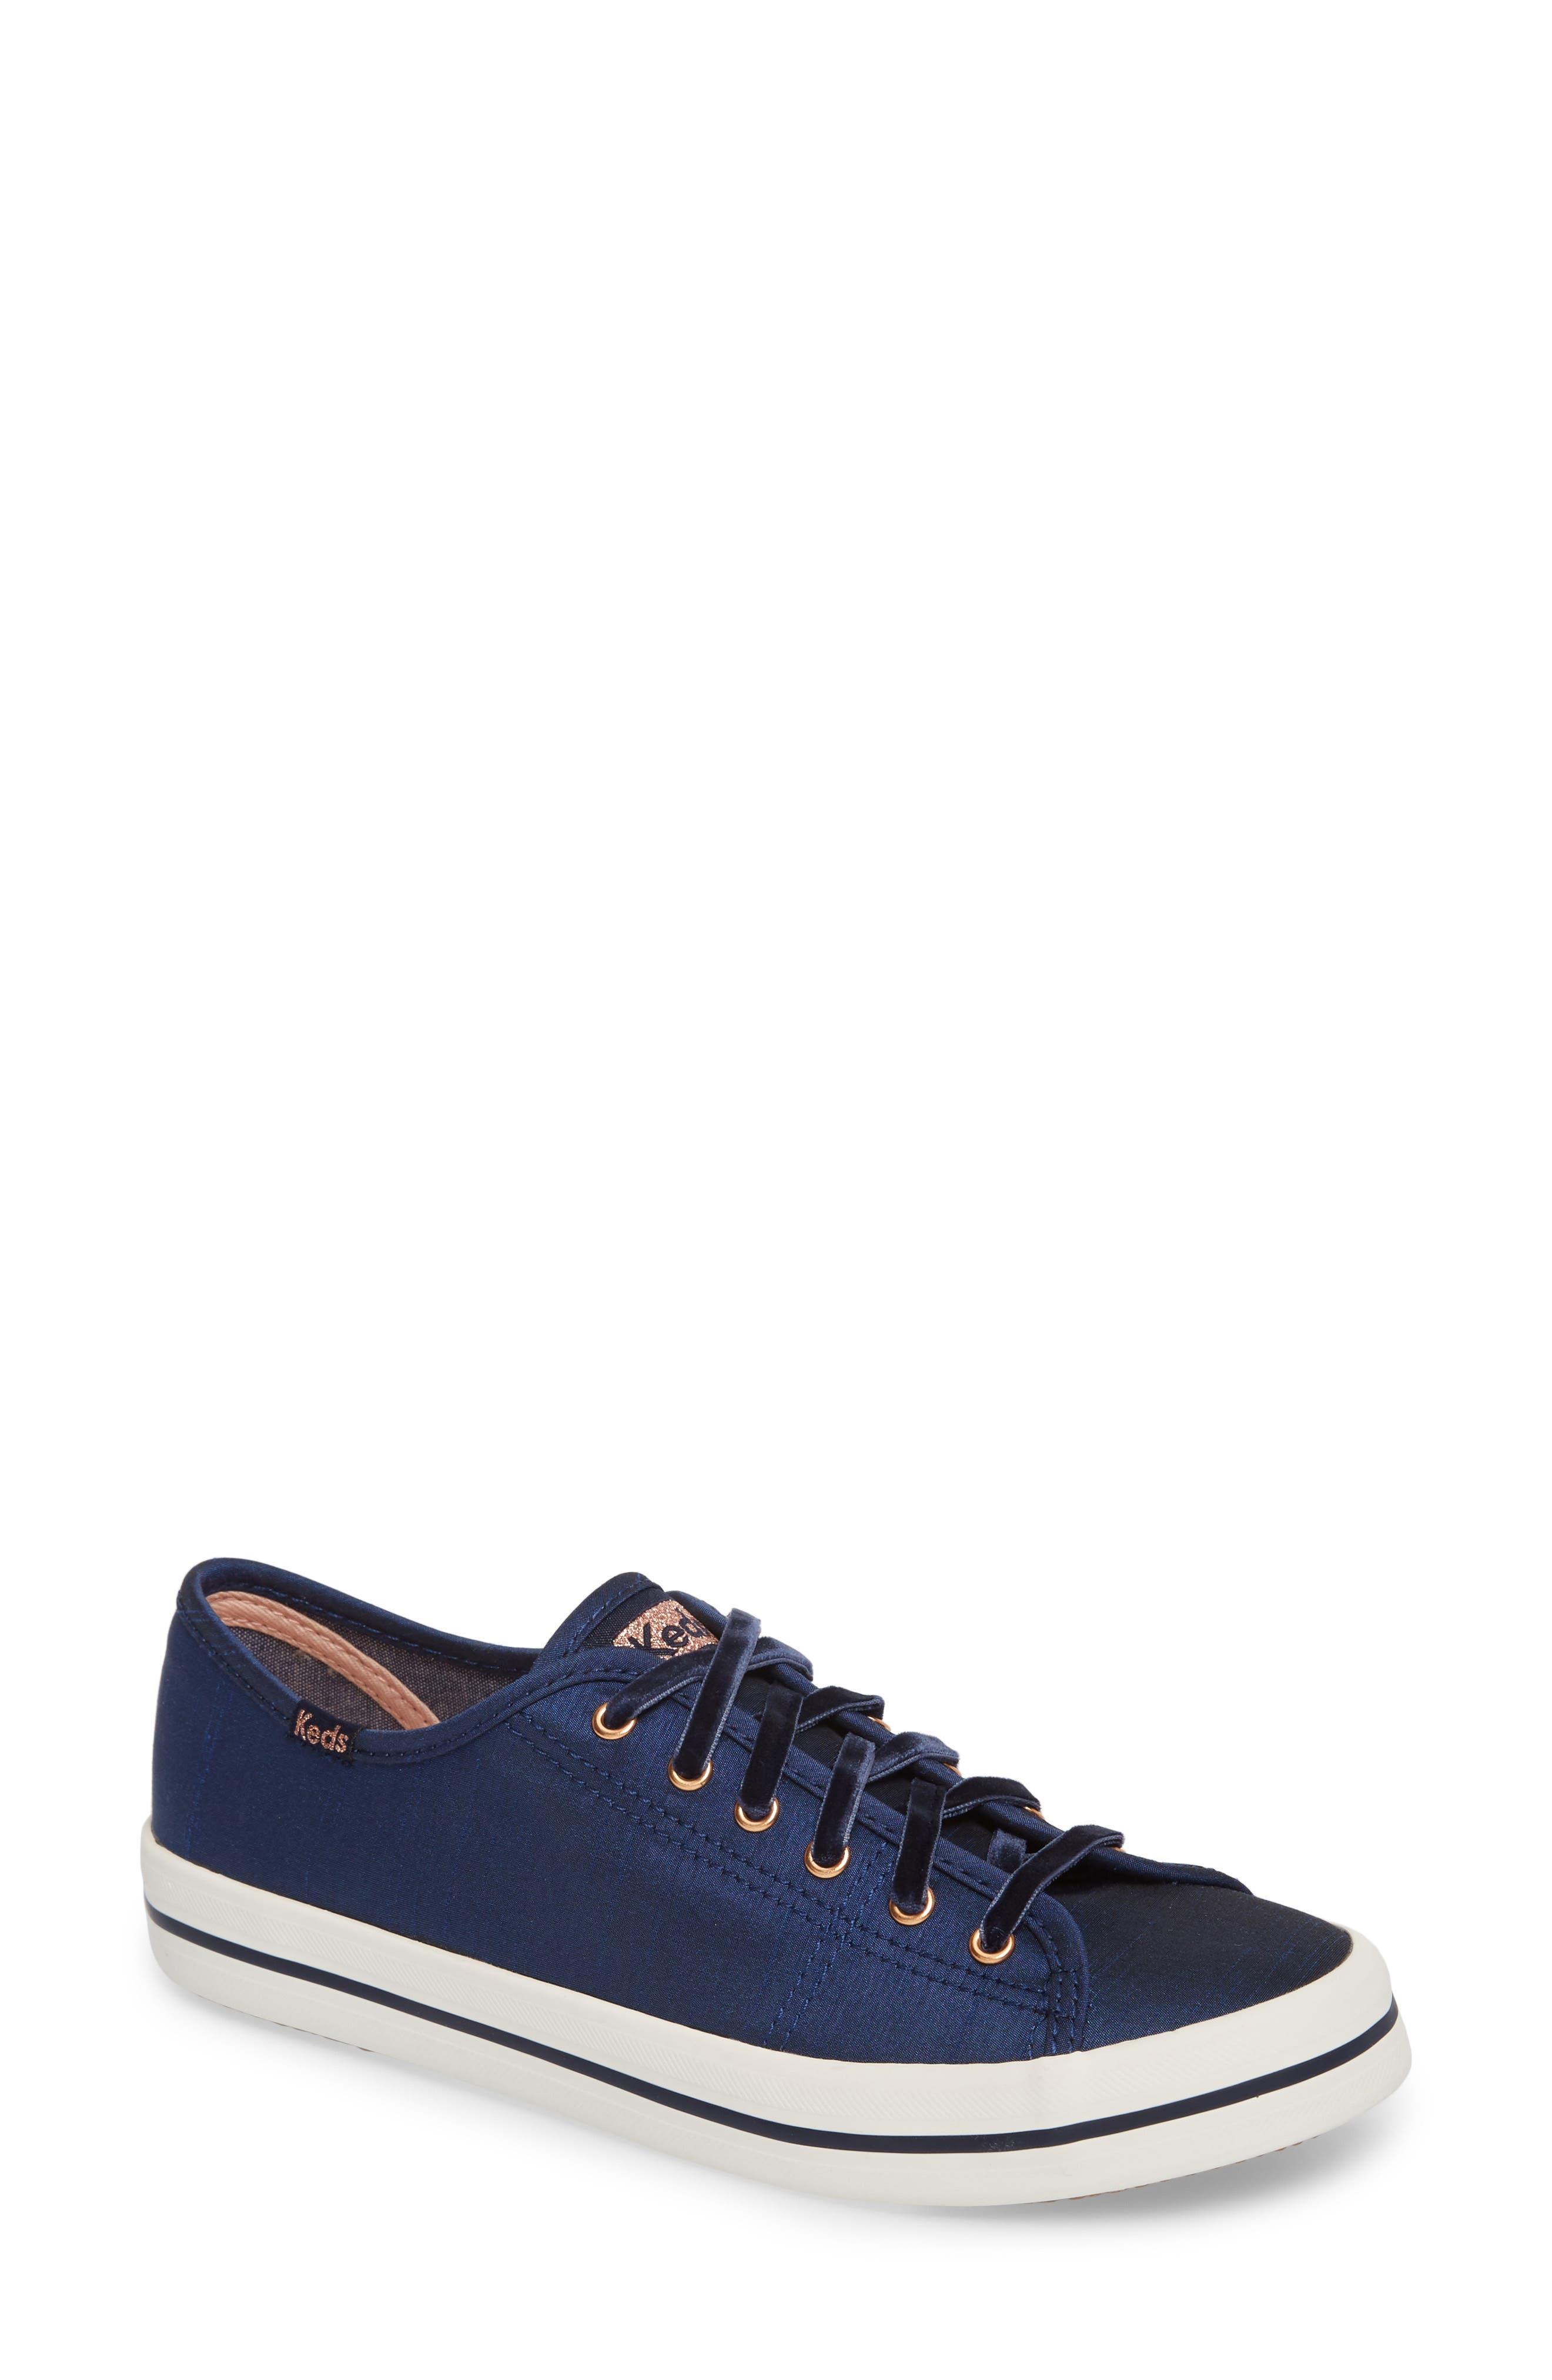 Kickstart Sneaker,                         Main,                         color, Navy Satin